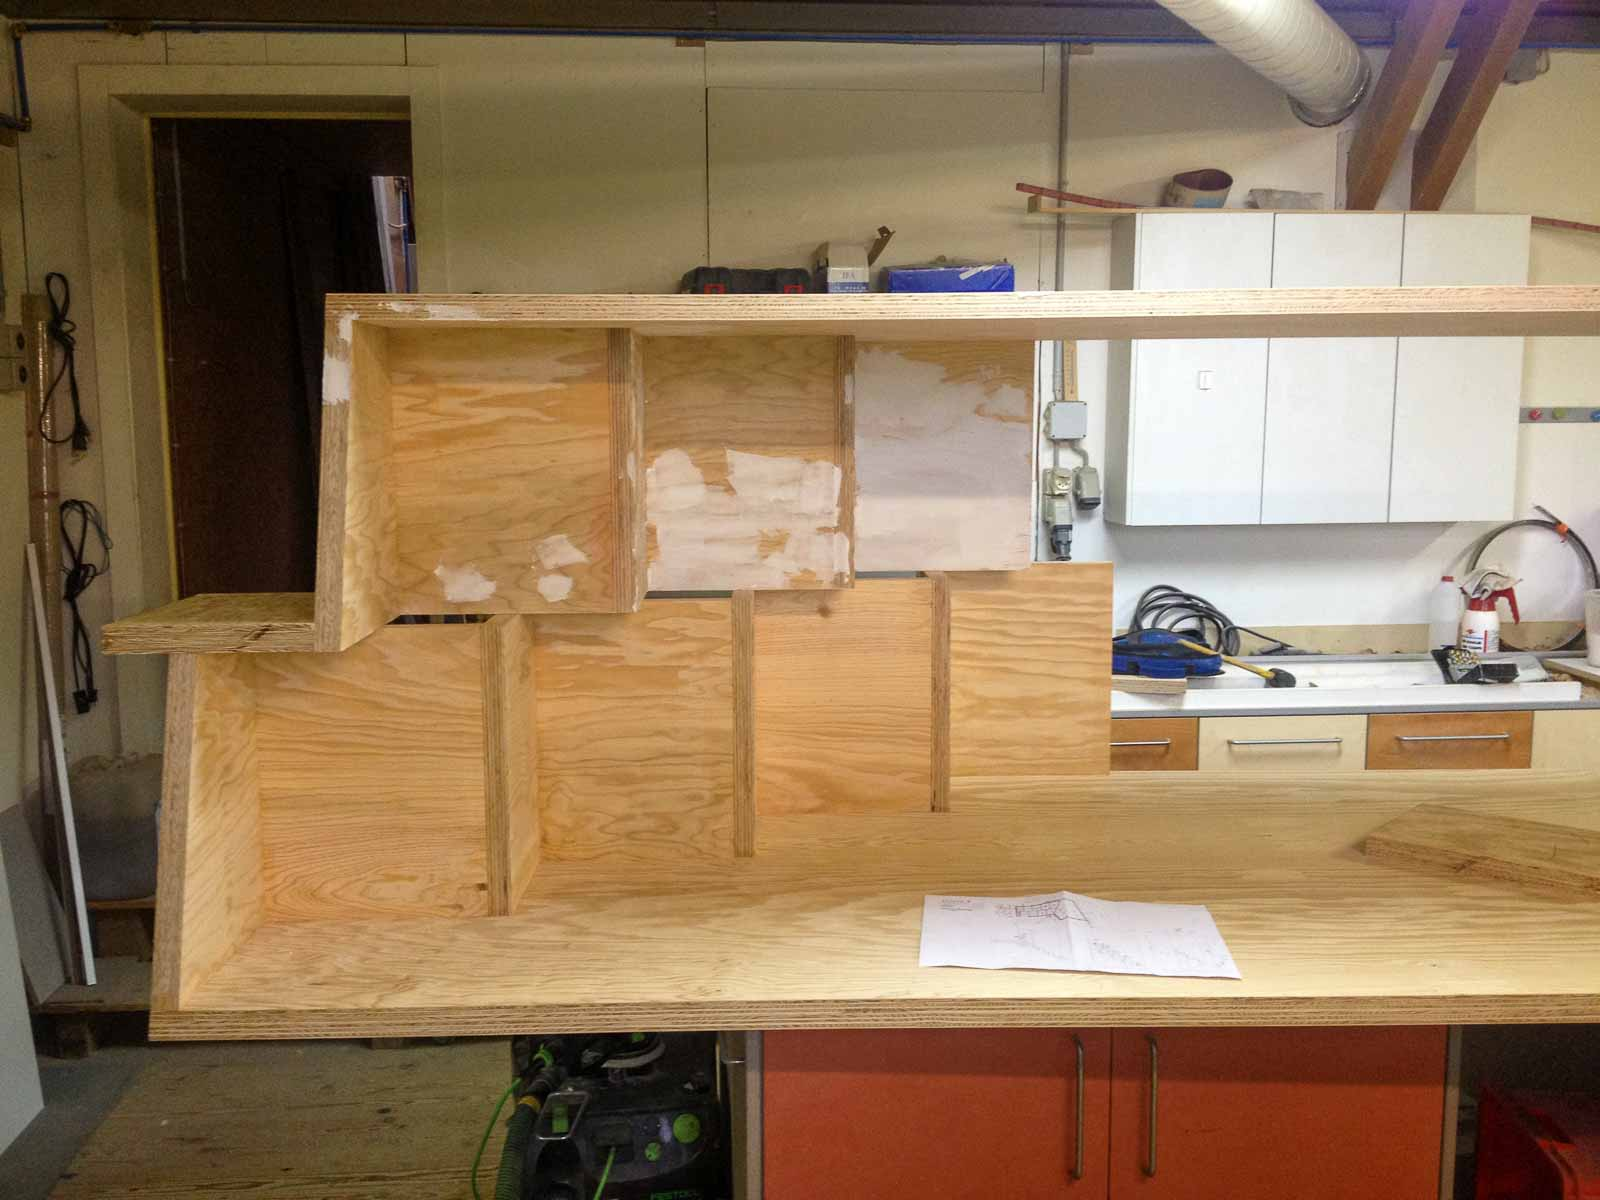 Wooddesign_Holzdesign_Treppe_Holztreppe_schwebend_2-teilig_atelierducret_freiburg(5)